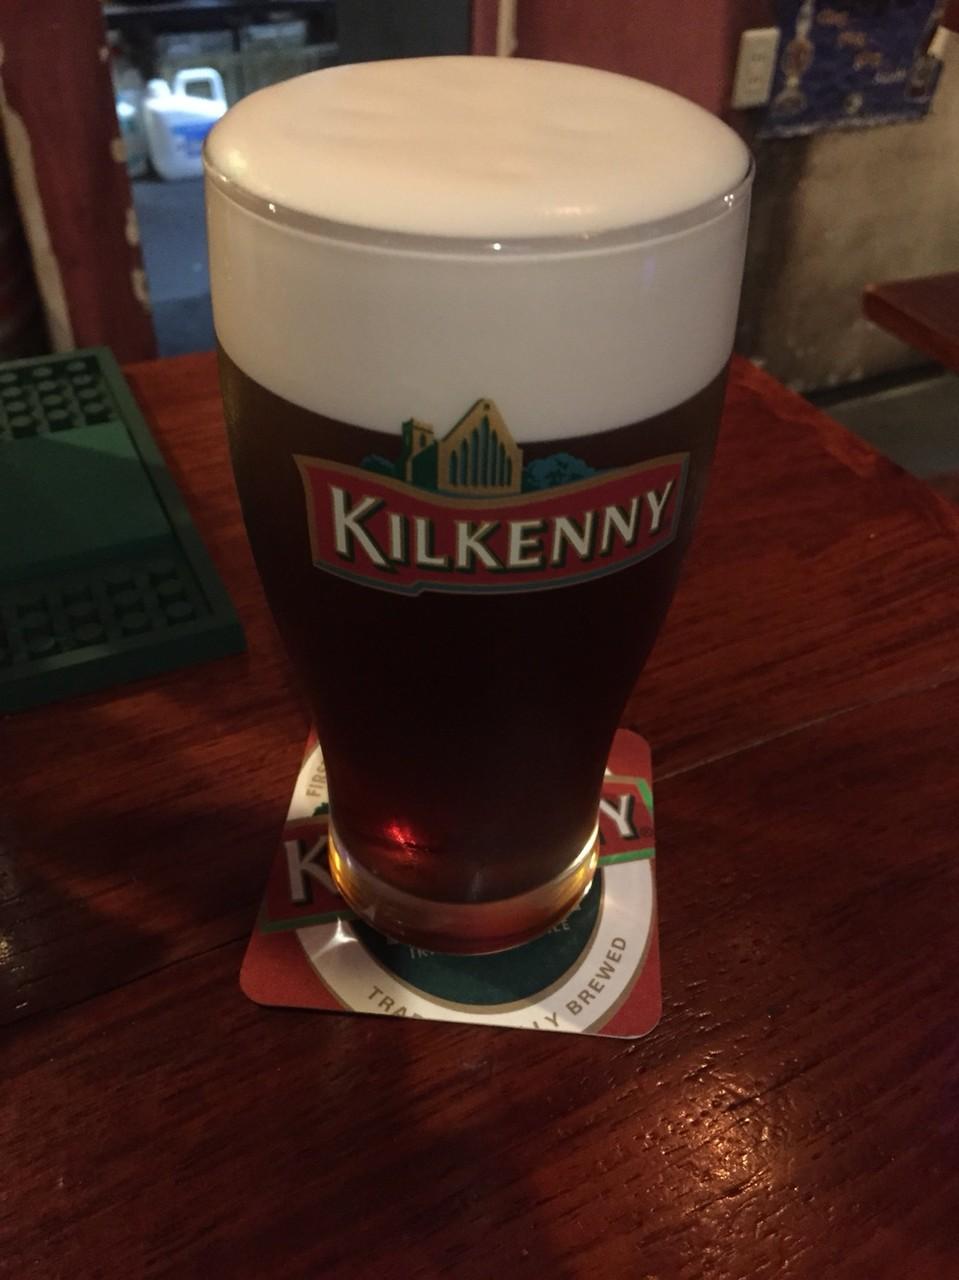 Kilkenny beer at Country Clare Irish Pub Tokyo Tachikawa